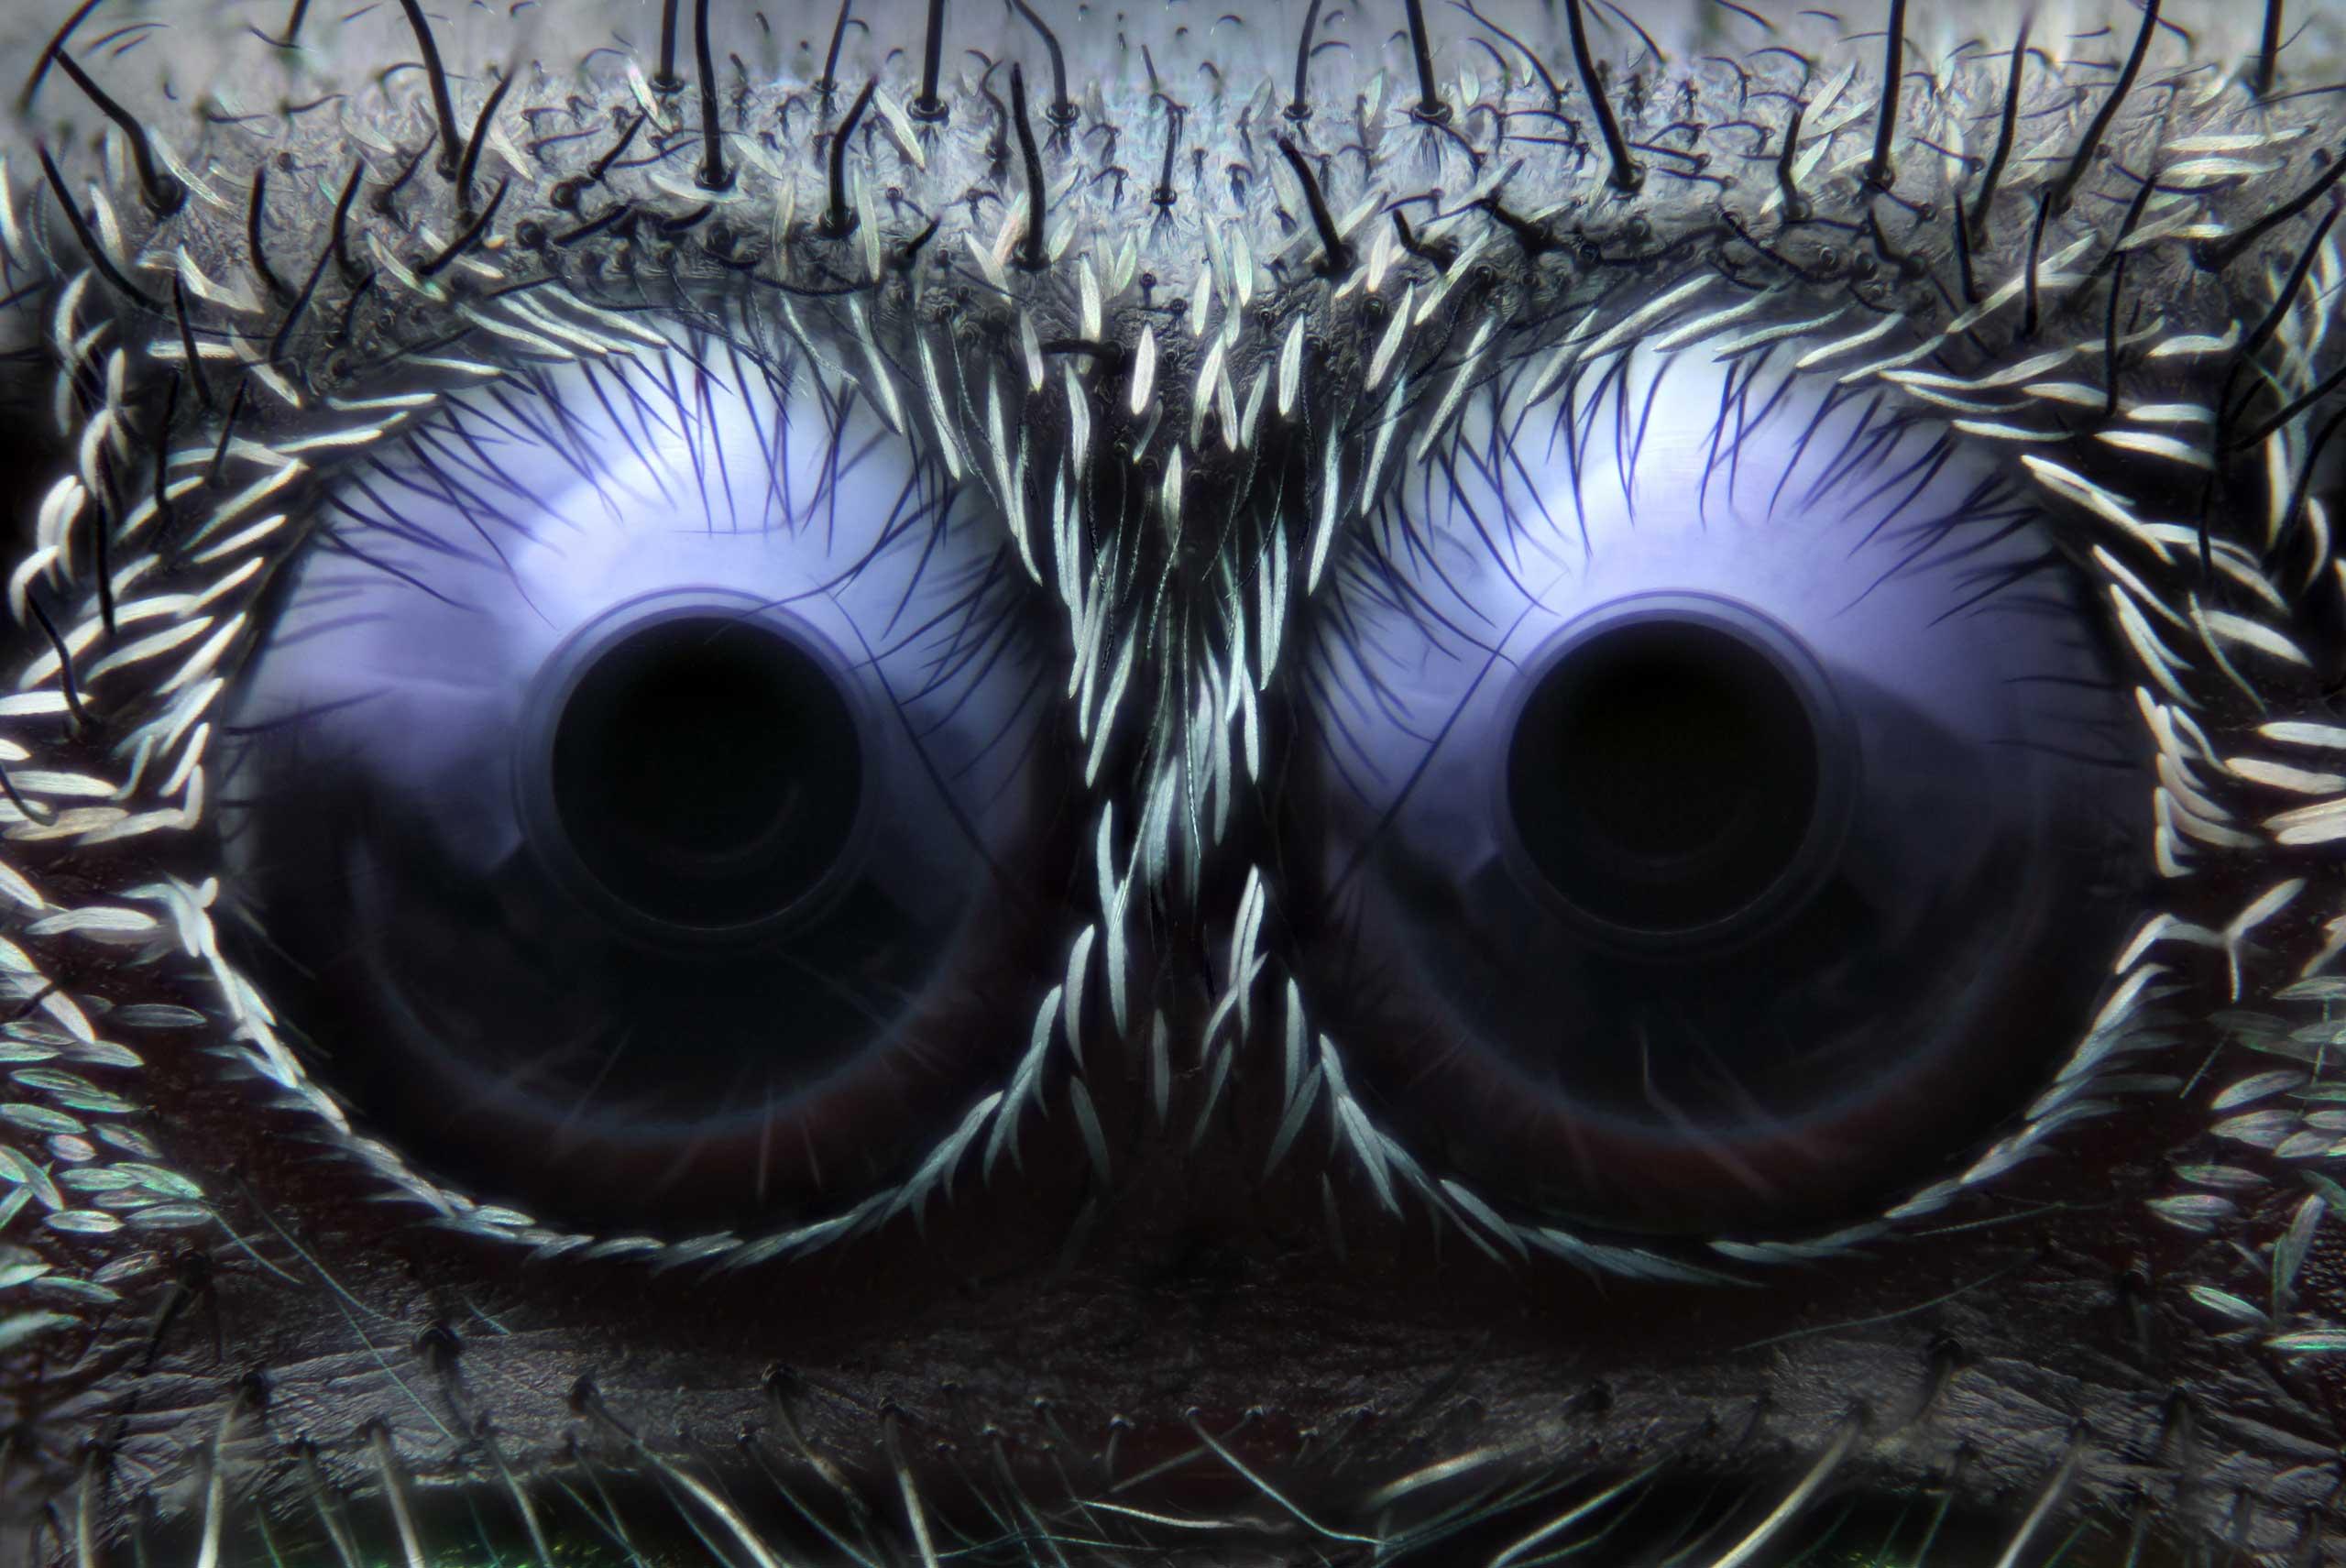 Jumping spider eyes at 20x magnification.